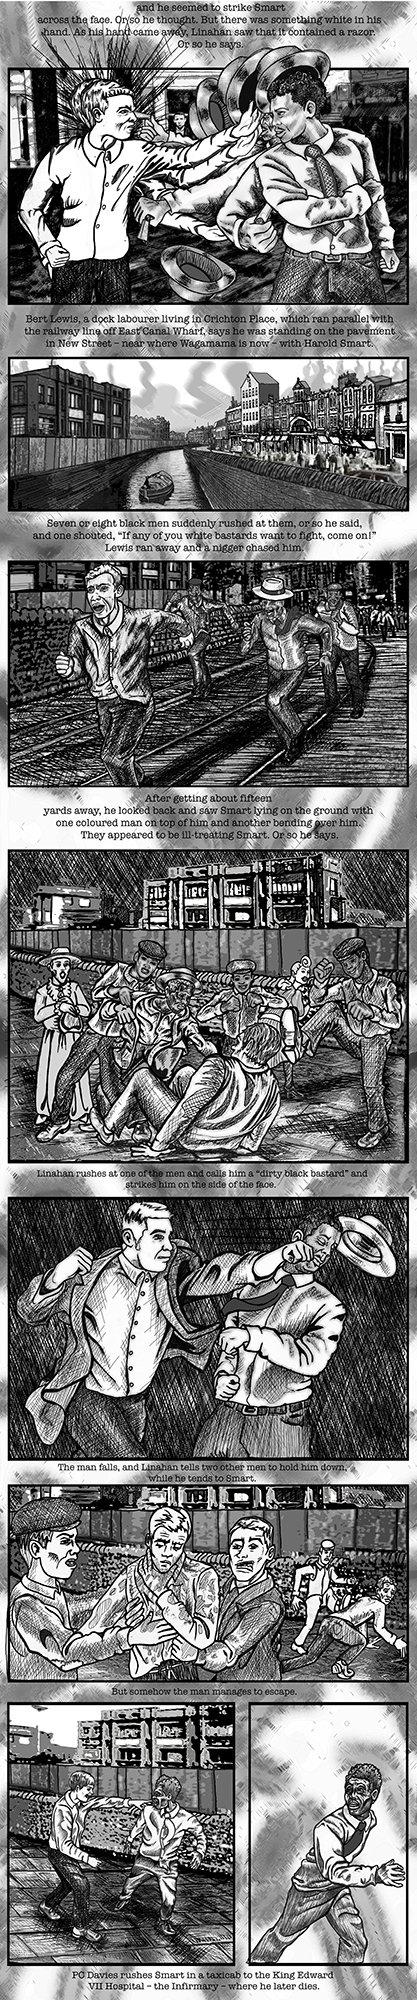 Page02-Strip2.jpg